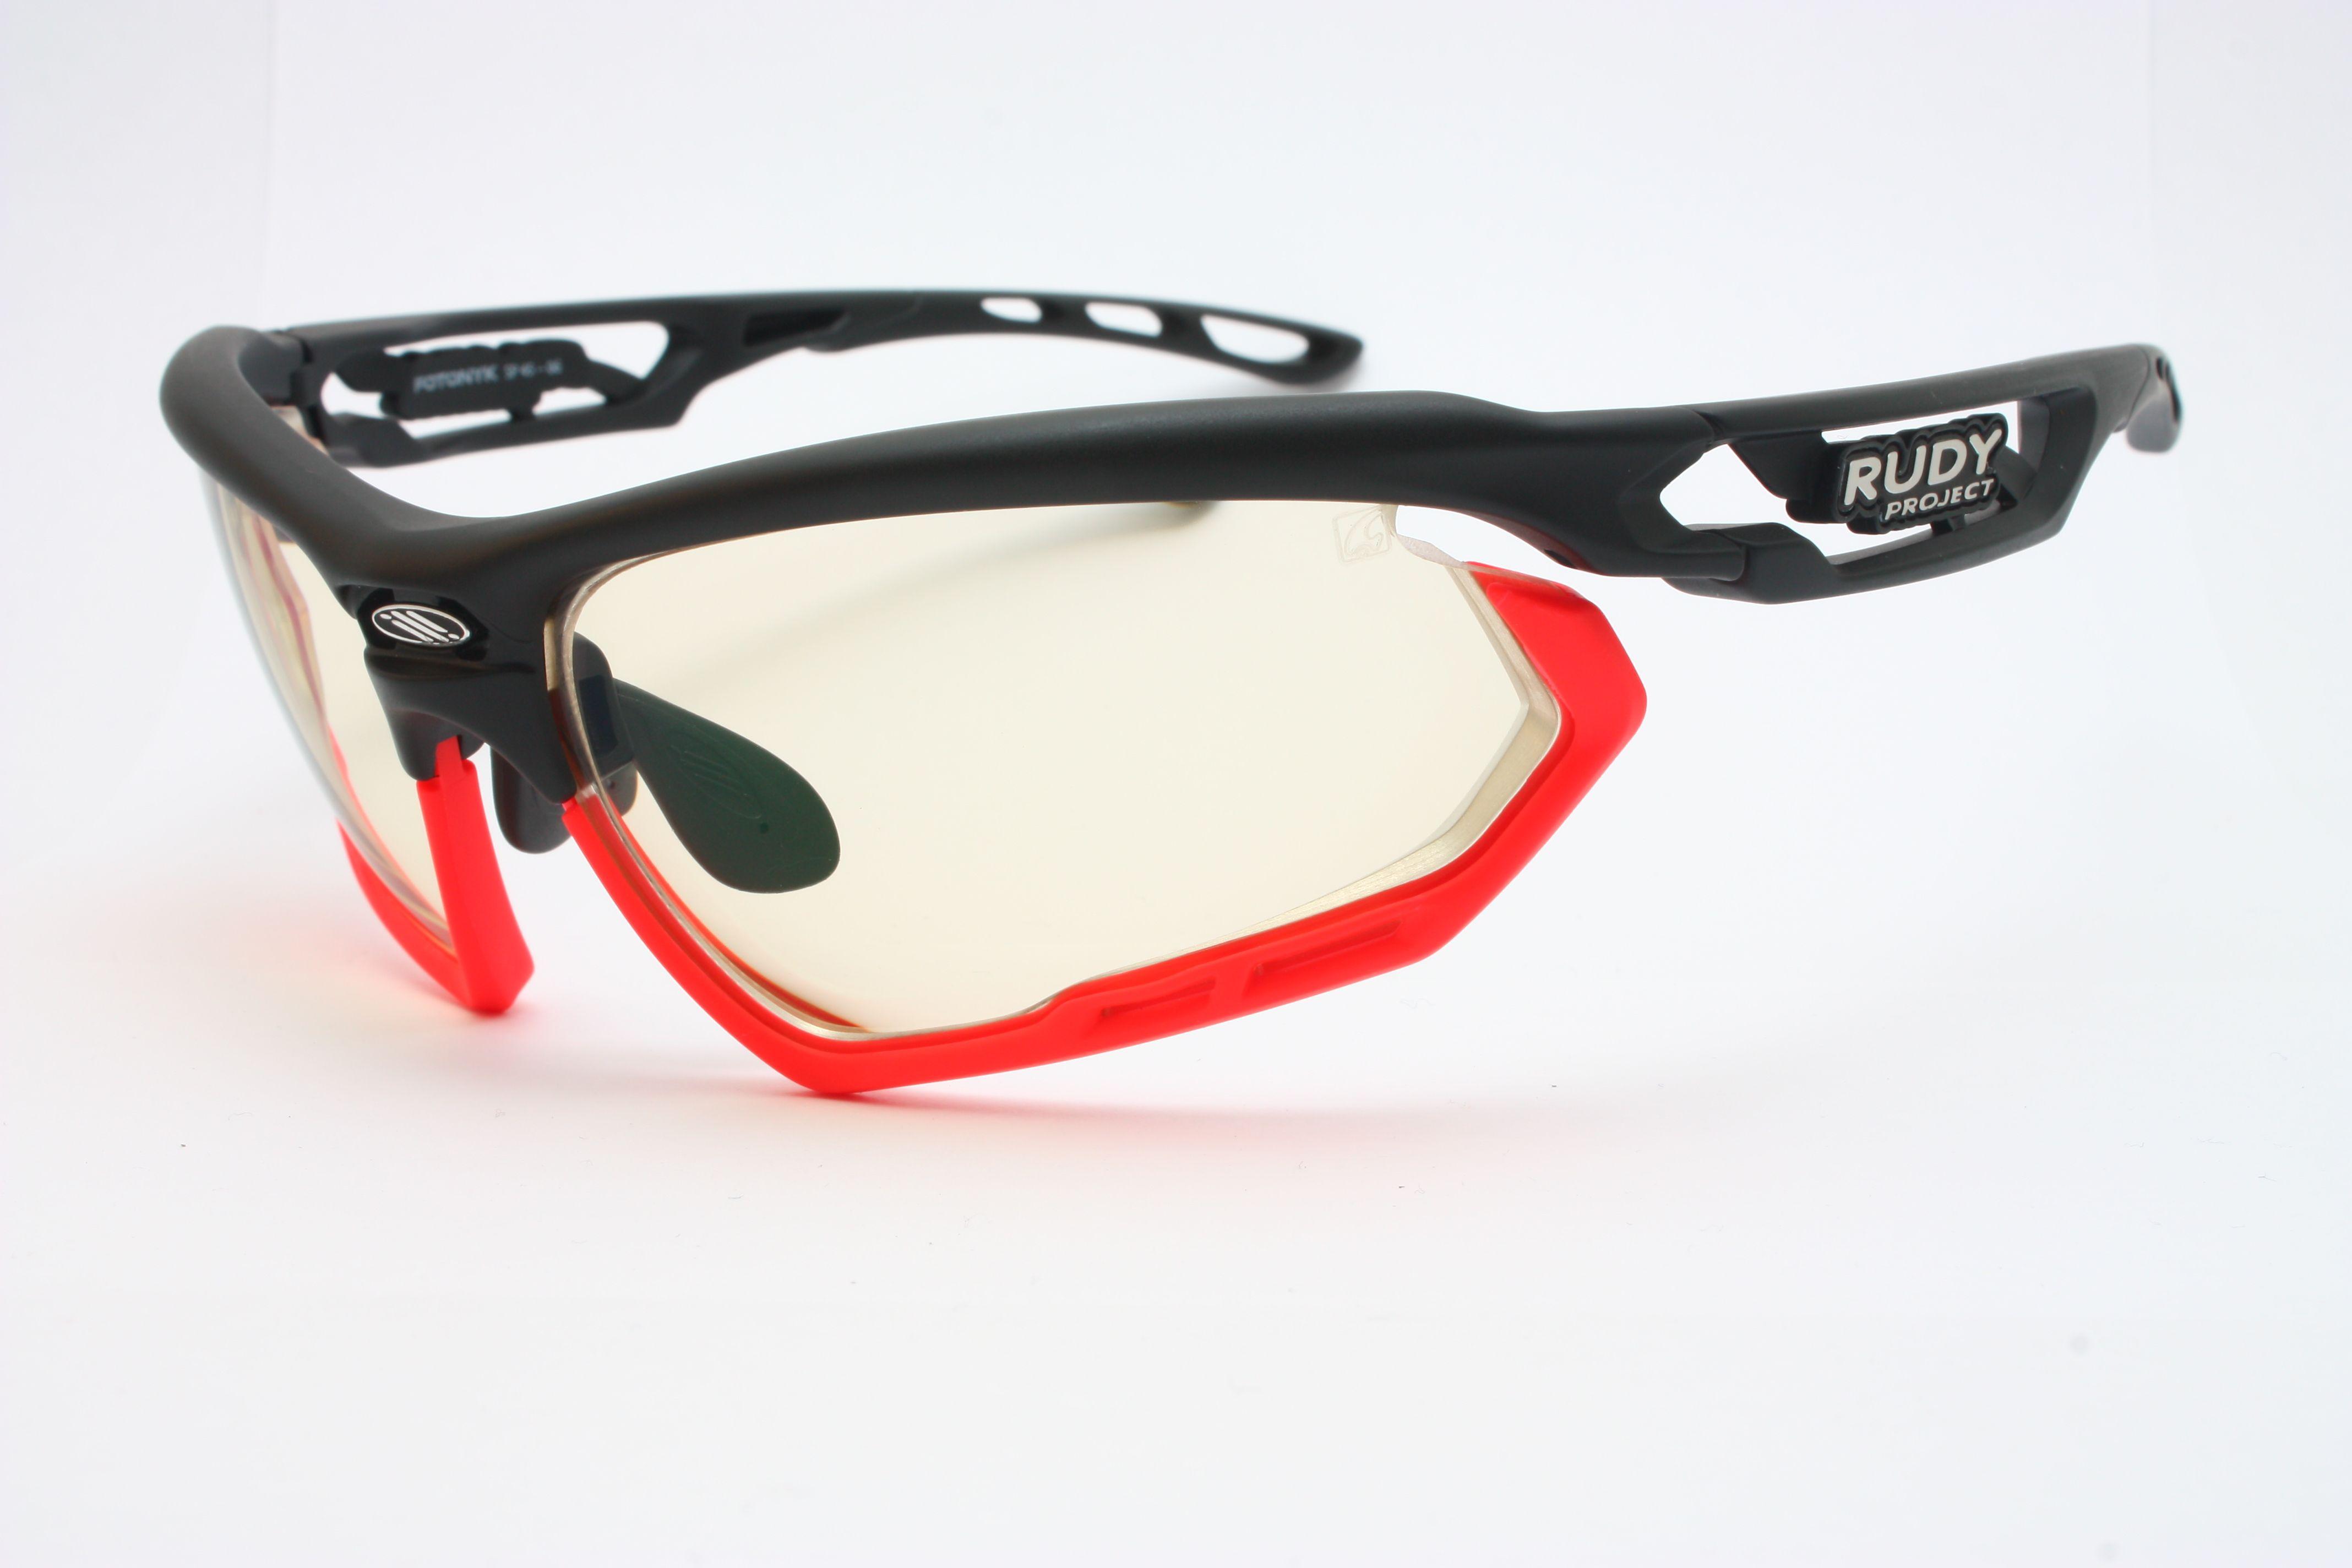 3d6dcfc893ce RudyProject FOTONYK sport eyewear with adhoc RX optic photochromic lenses